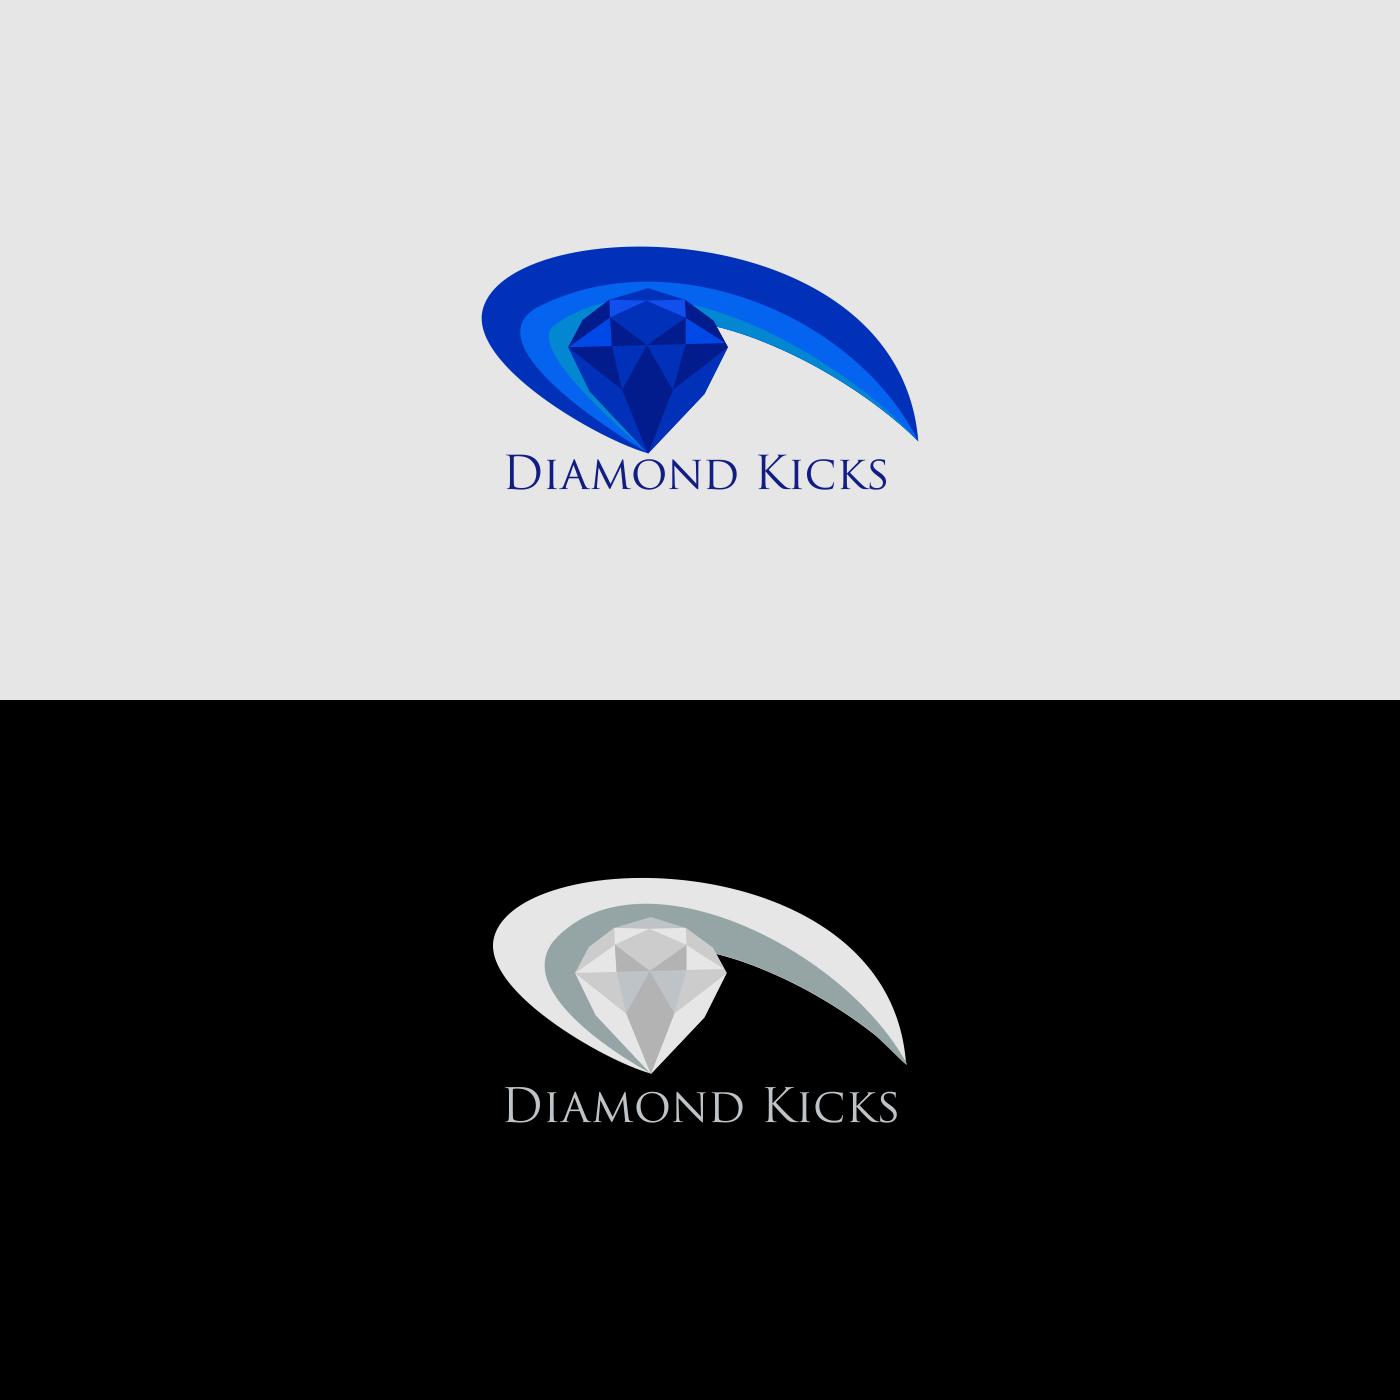 Business Logo Design for Diamond Kicks by ellesis 2  360a445f19